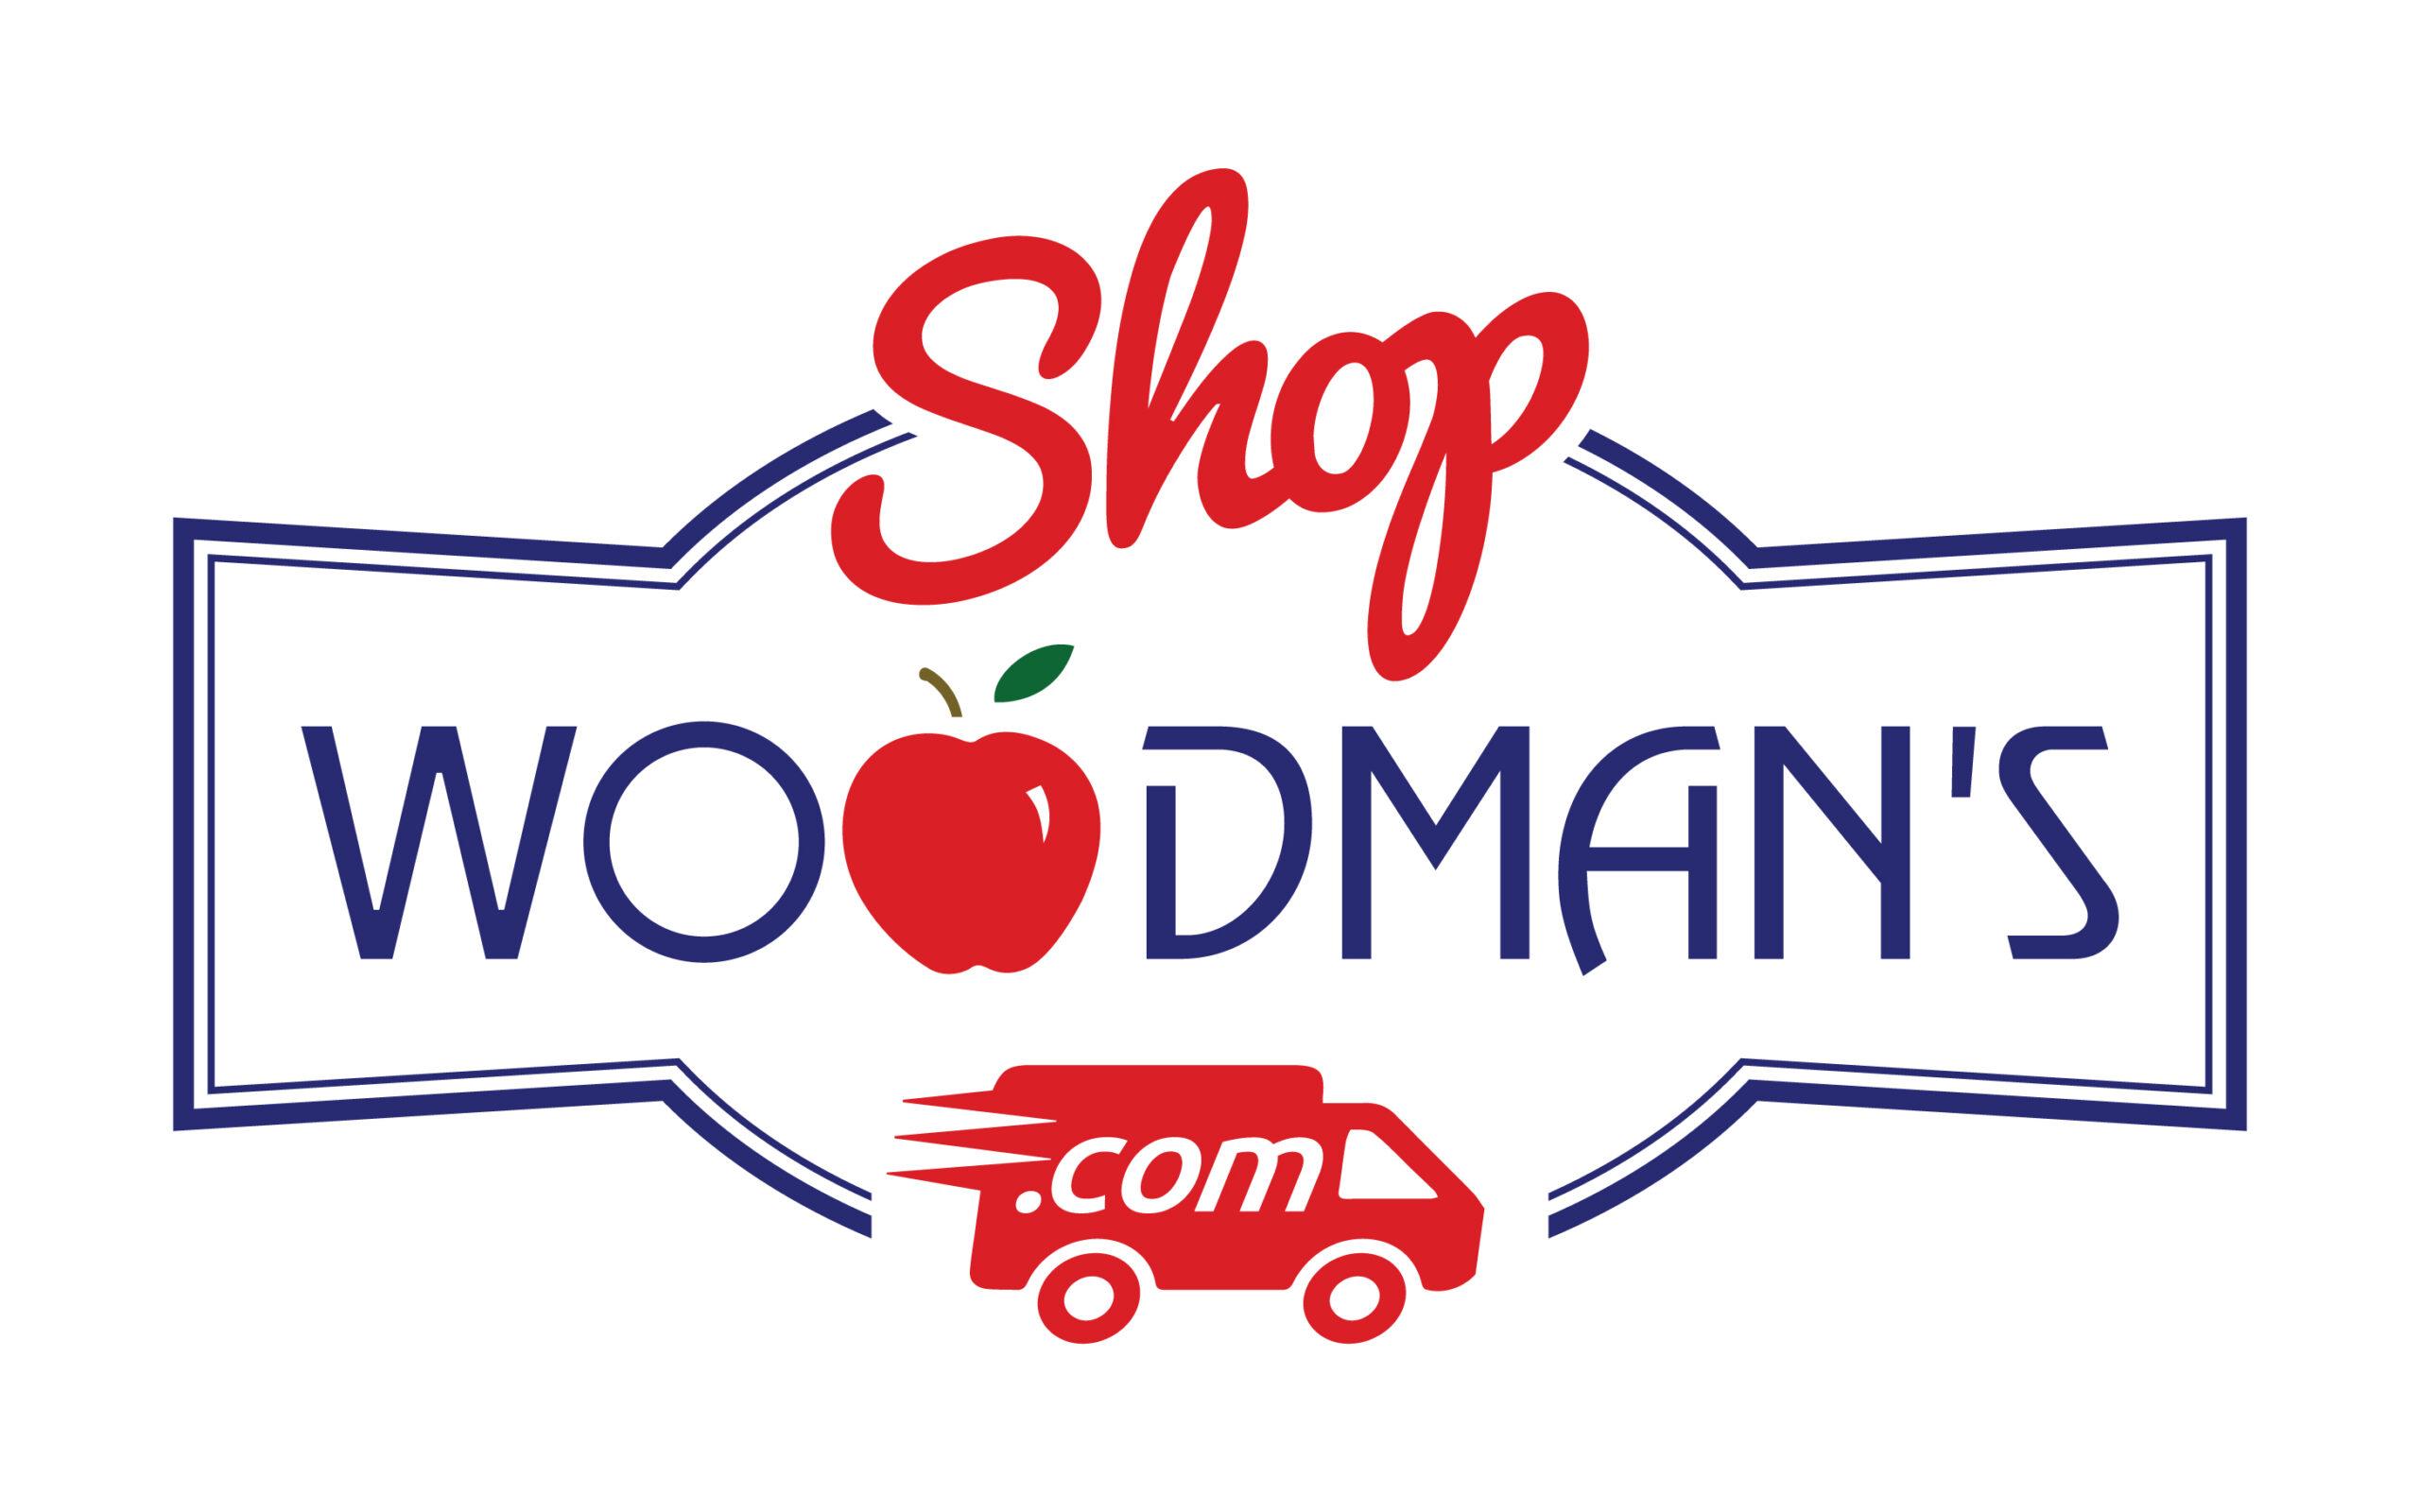 Woodman's logo